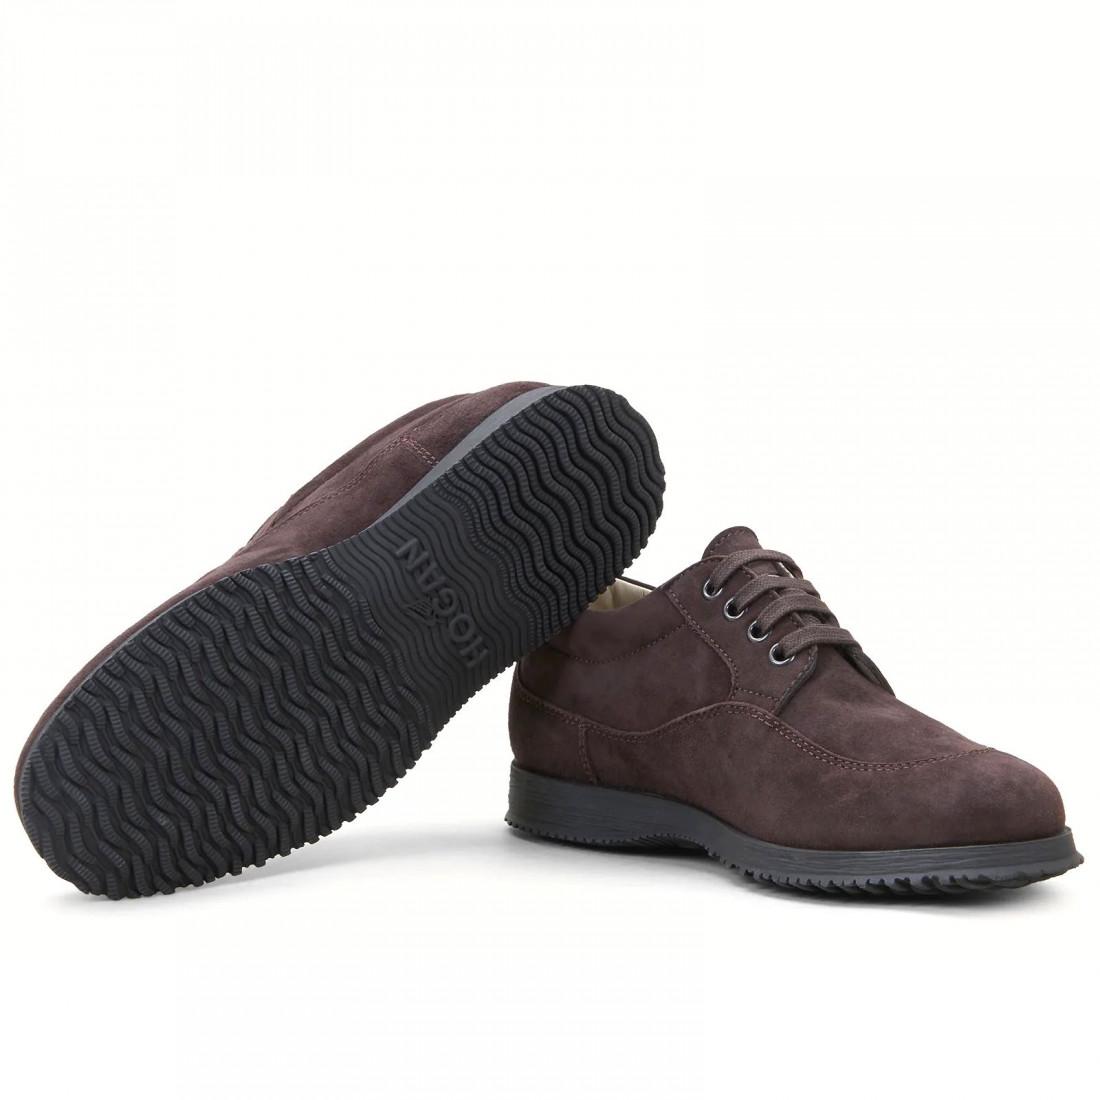 sneakers donna hogan hxw00e00010cr0s807 6461